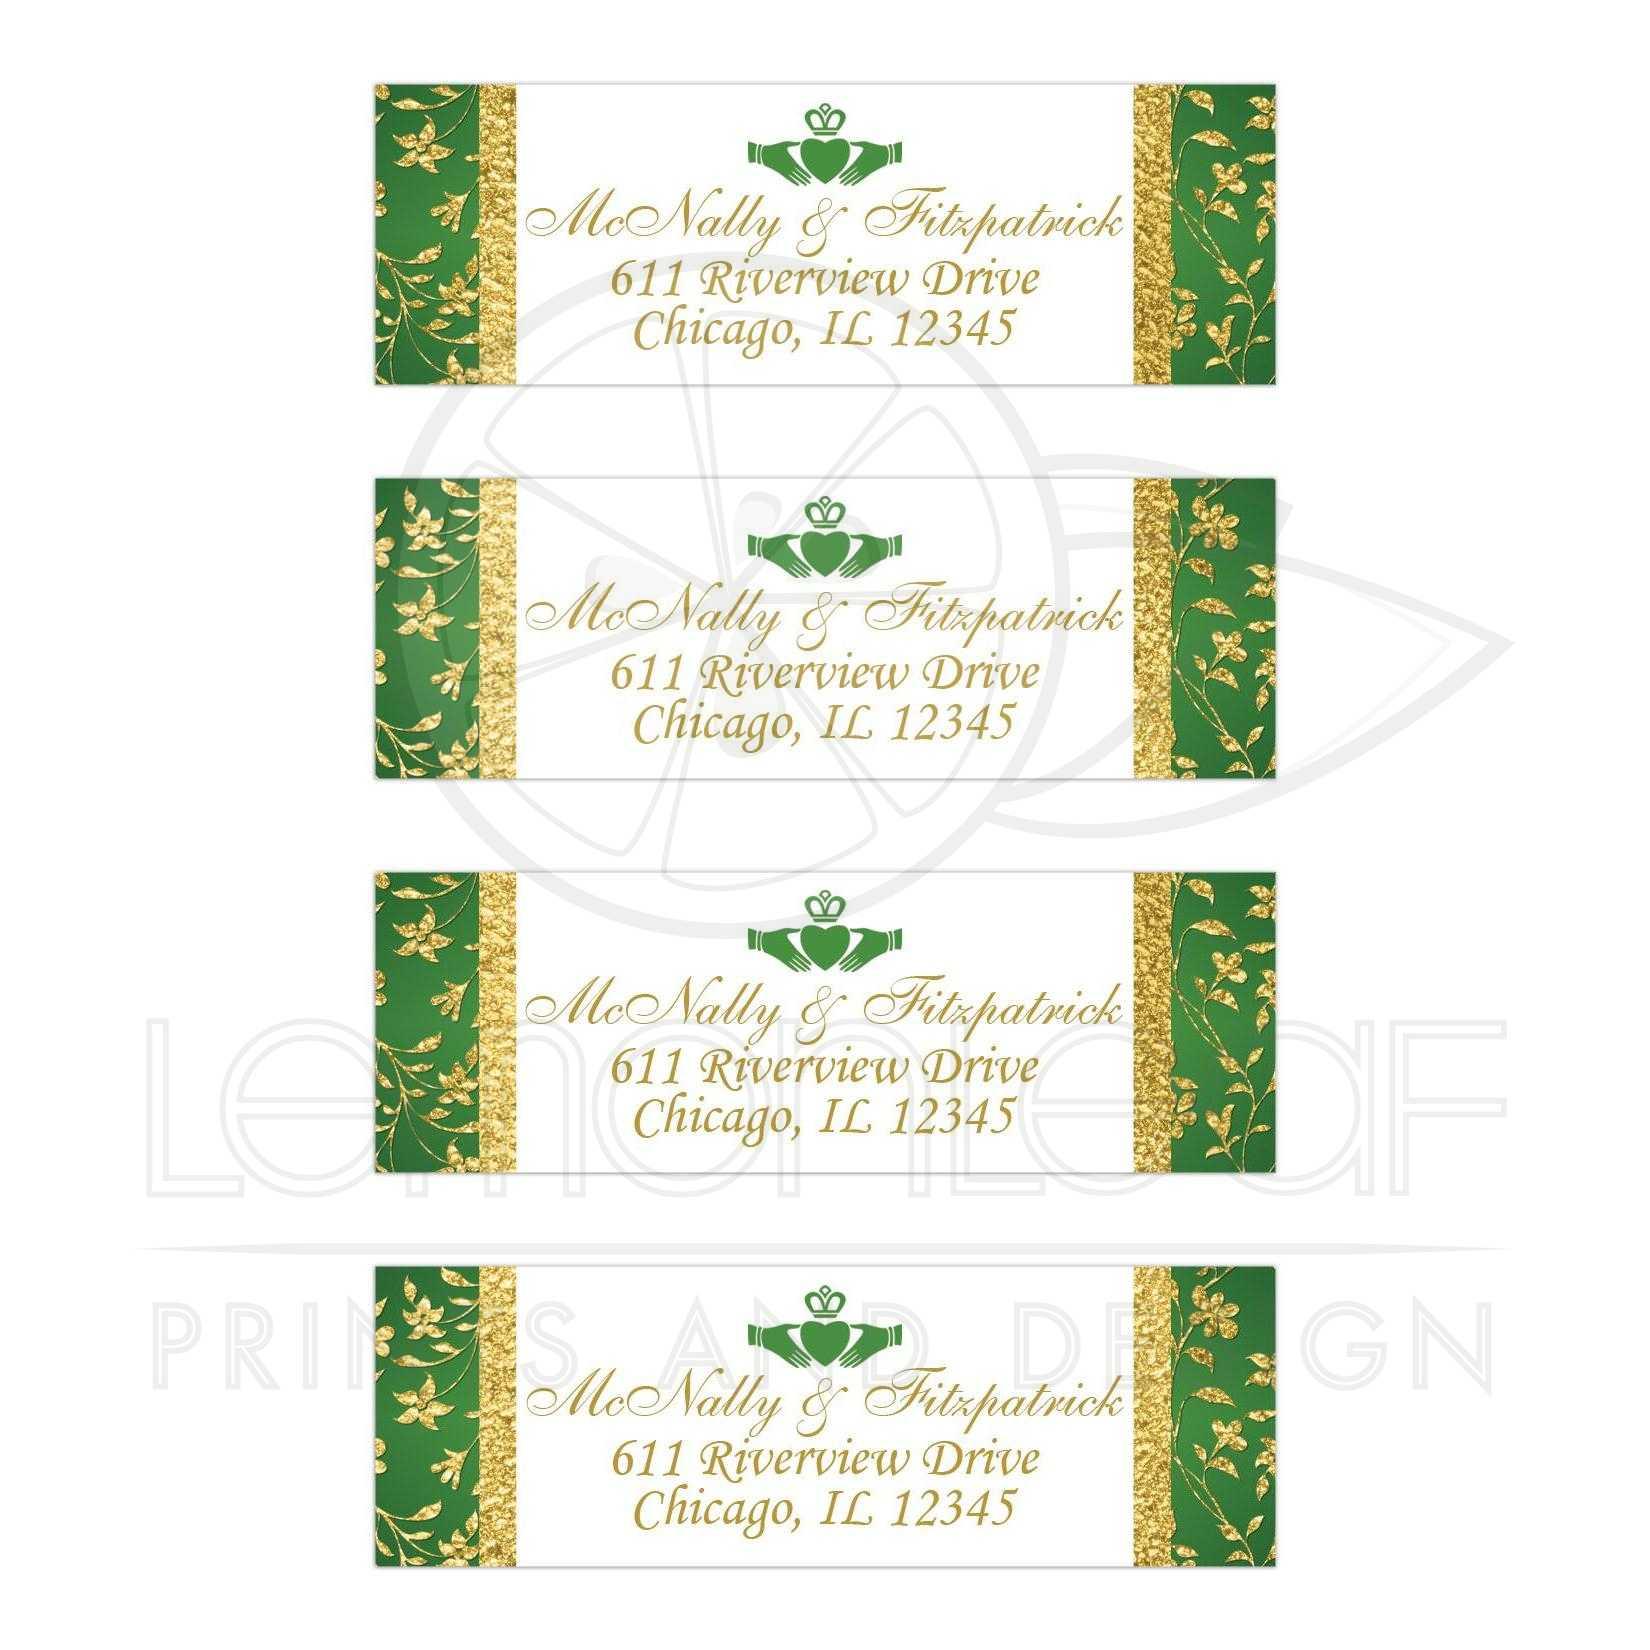 wedding address labels green white gold floral faux gold foil